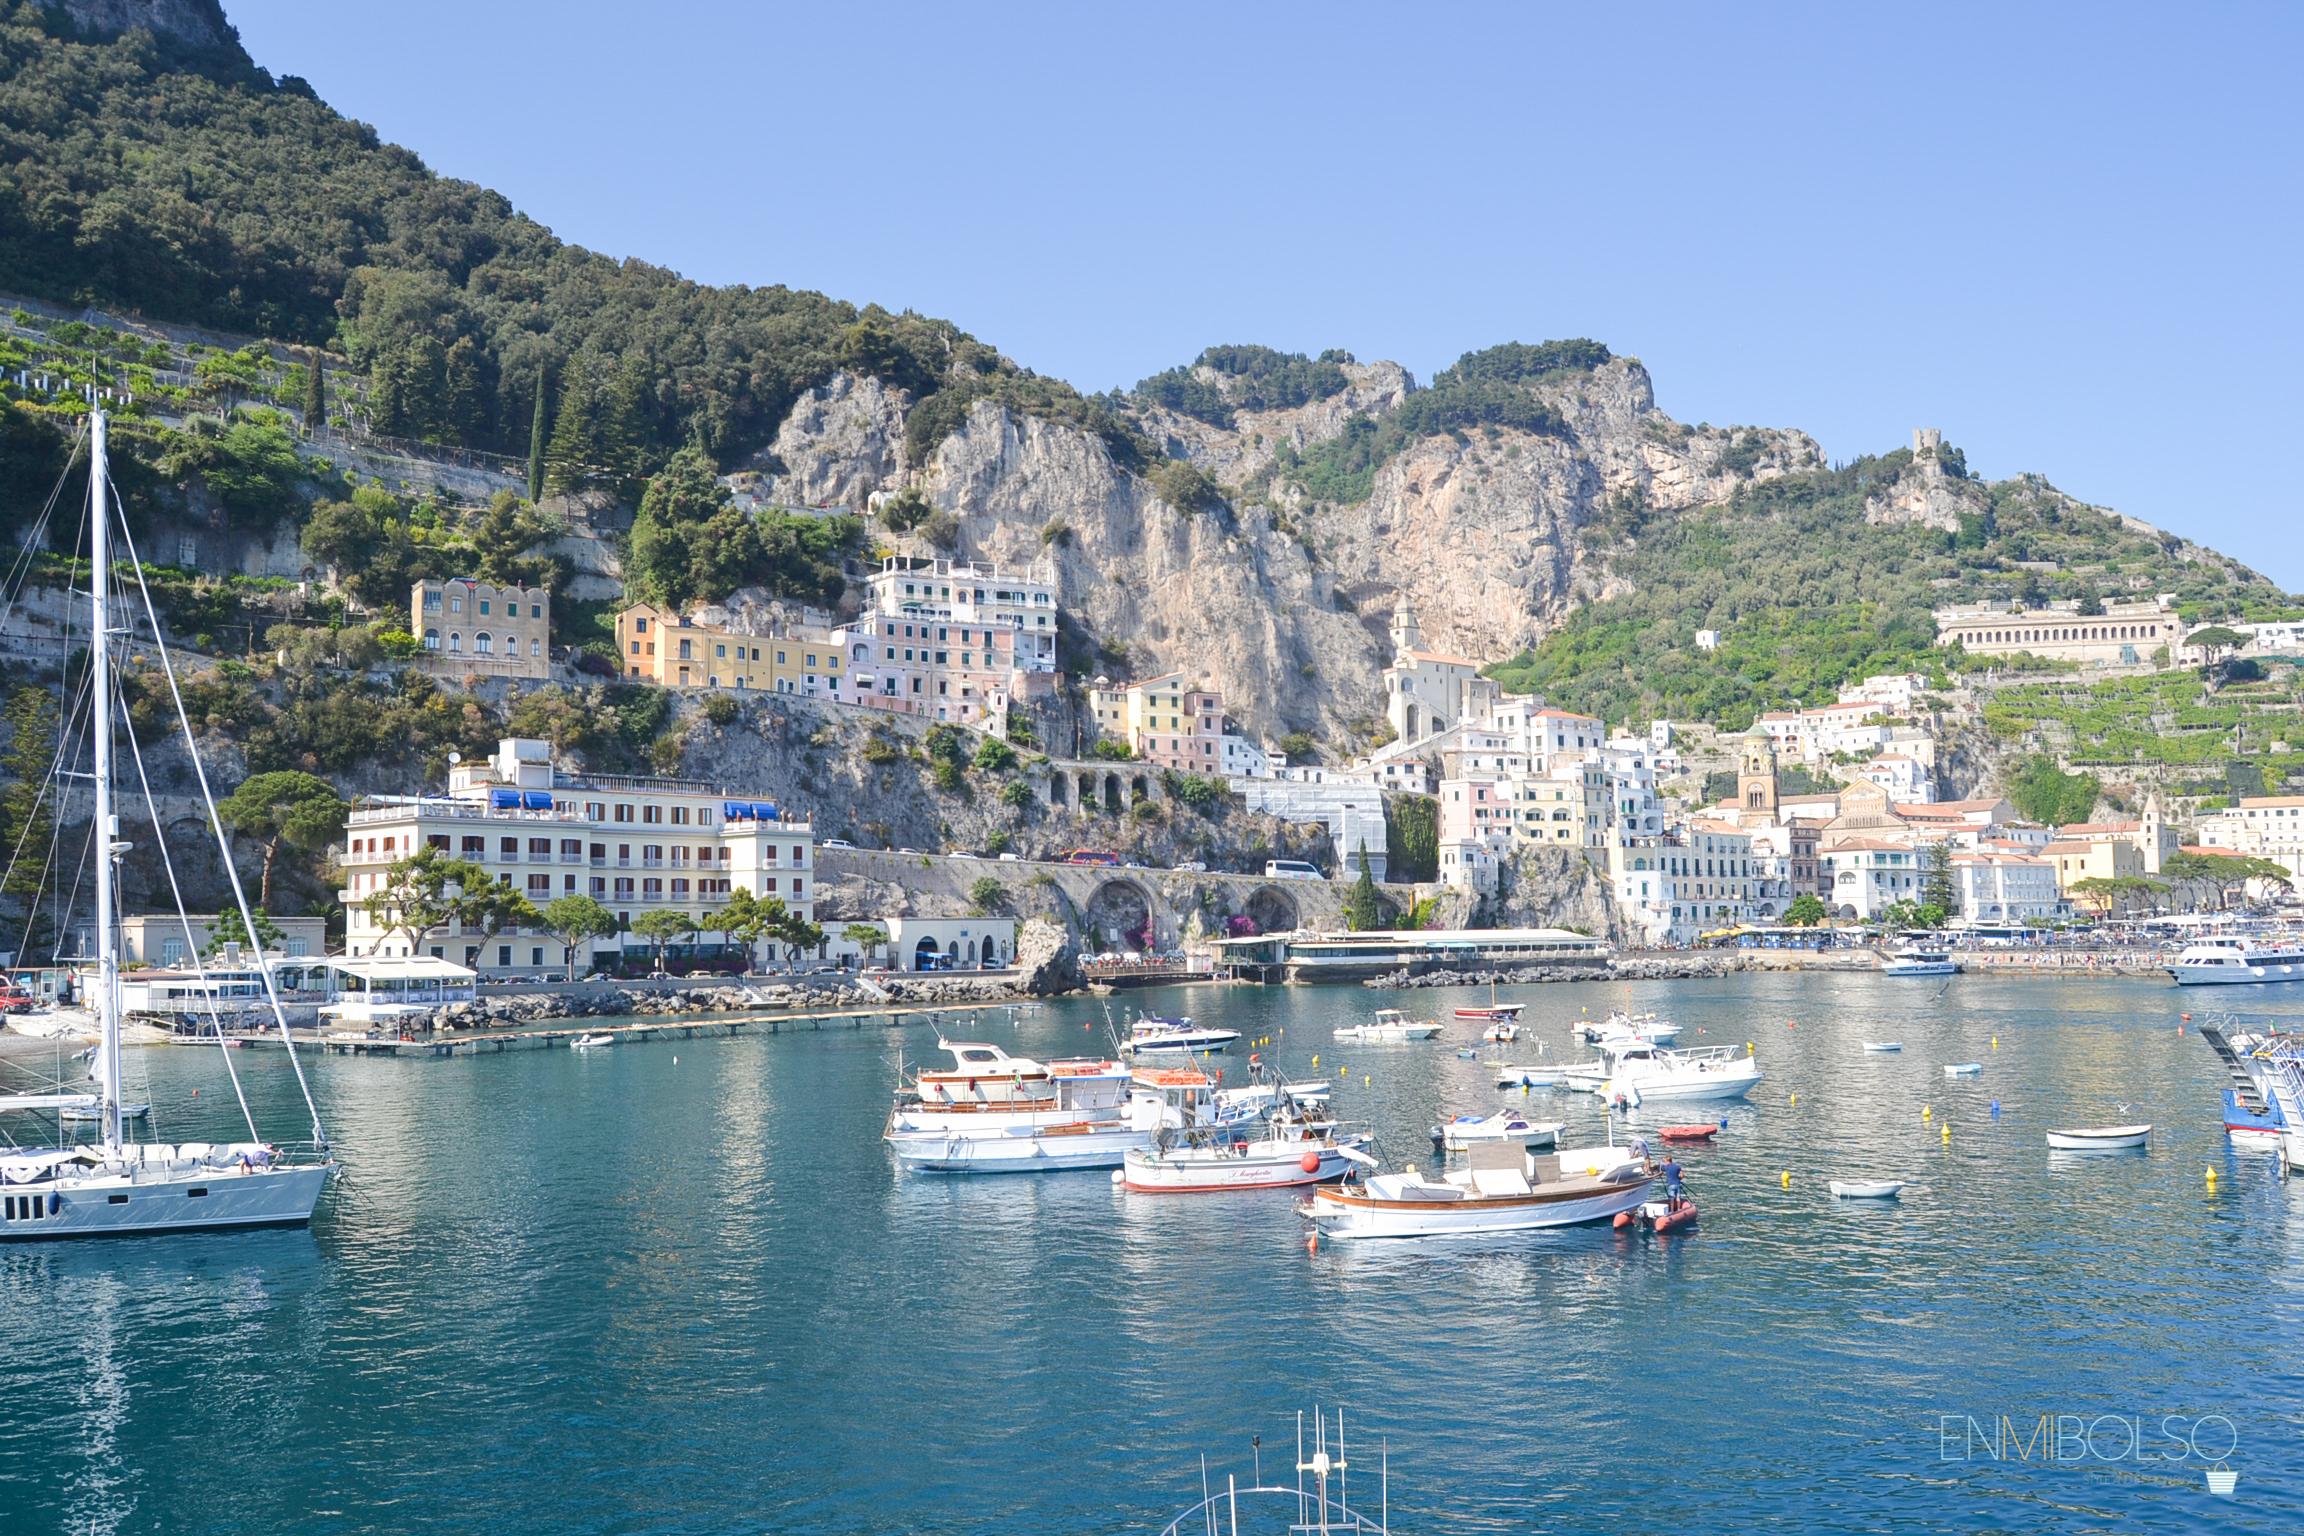 Amalfi-costa-enmibolso